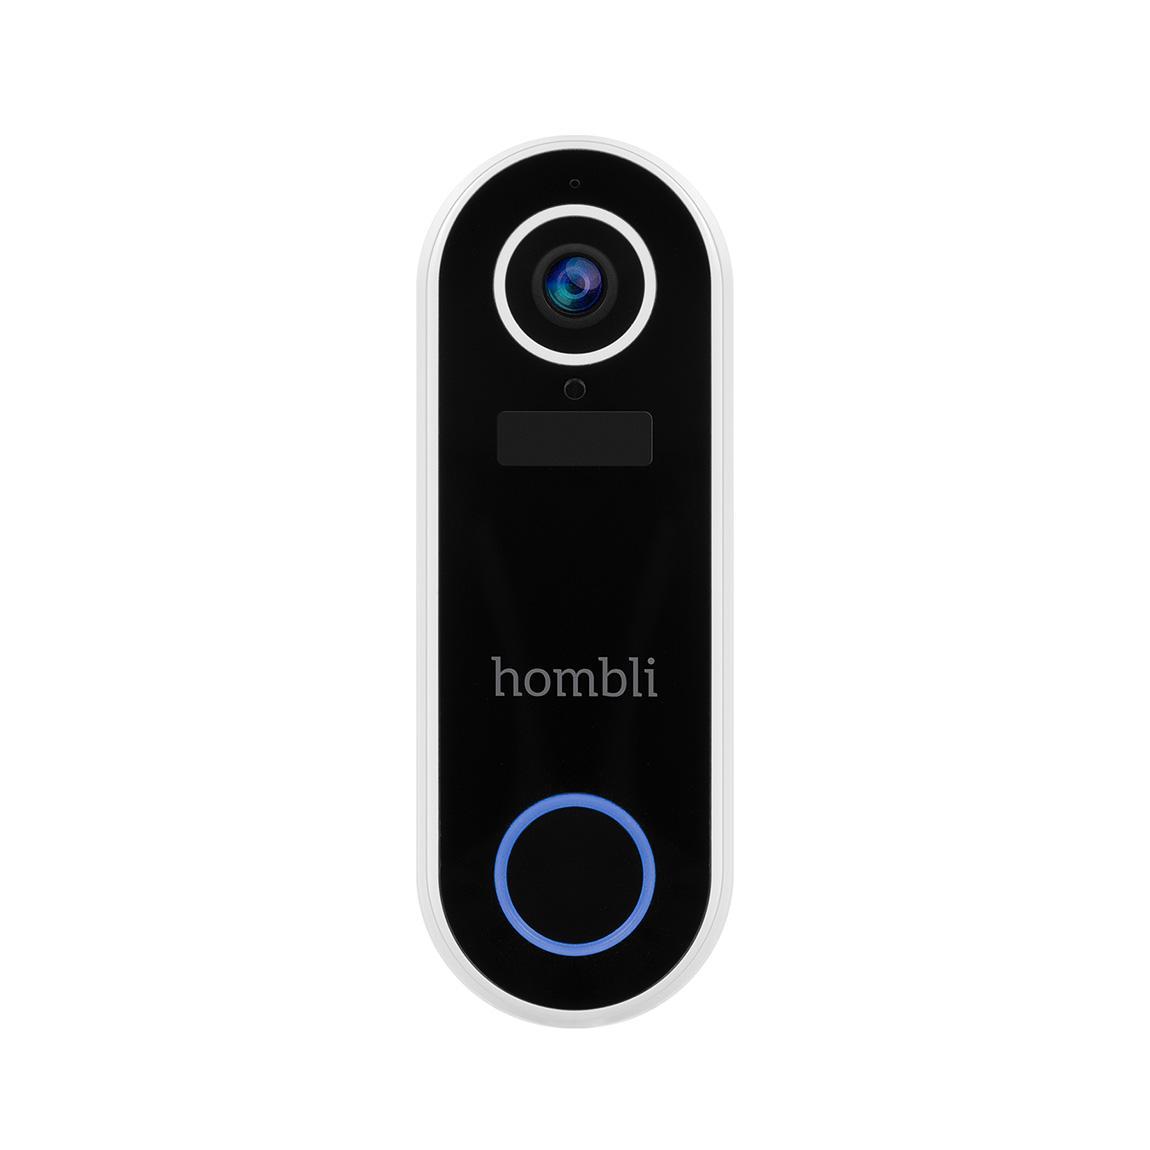 Hombli Smart Doorbell 2 - Smarte Video-Türklingel - white